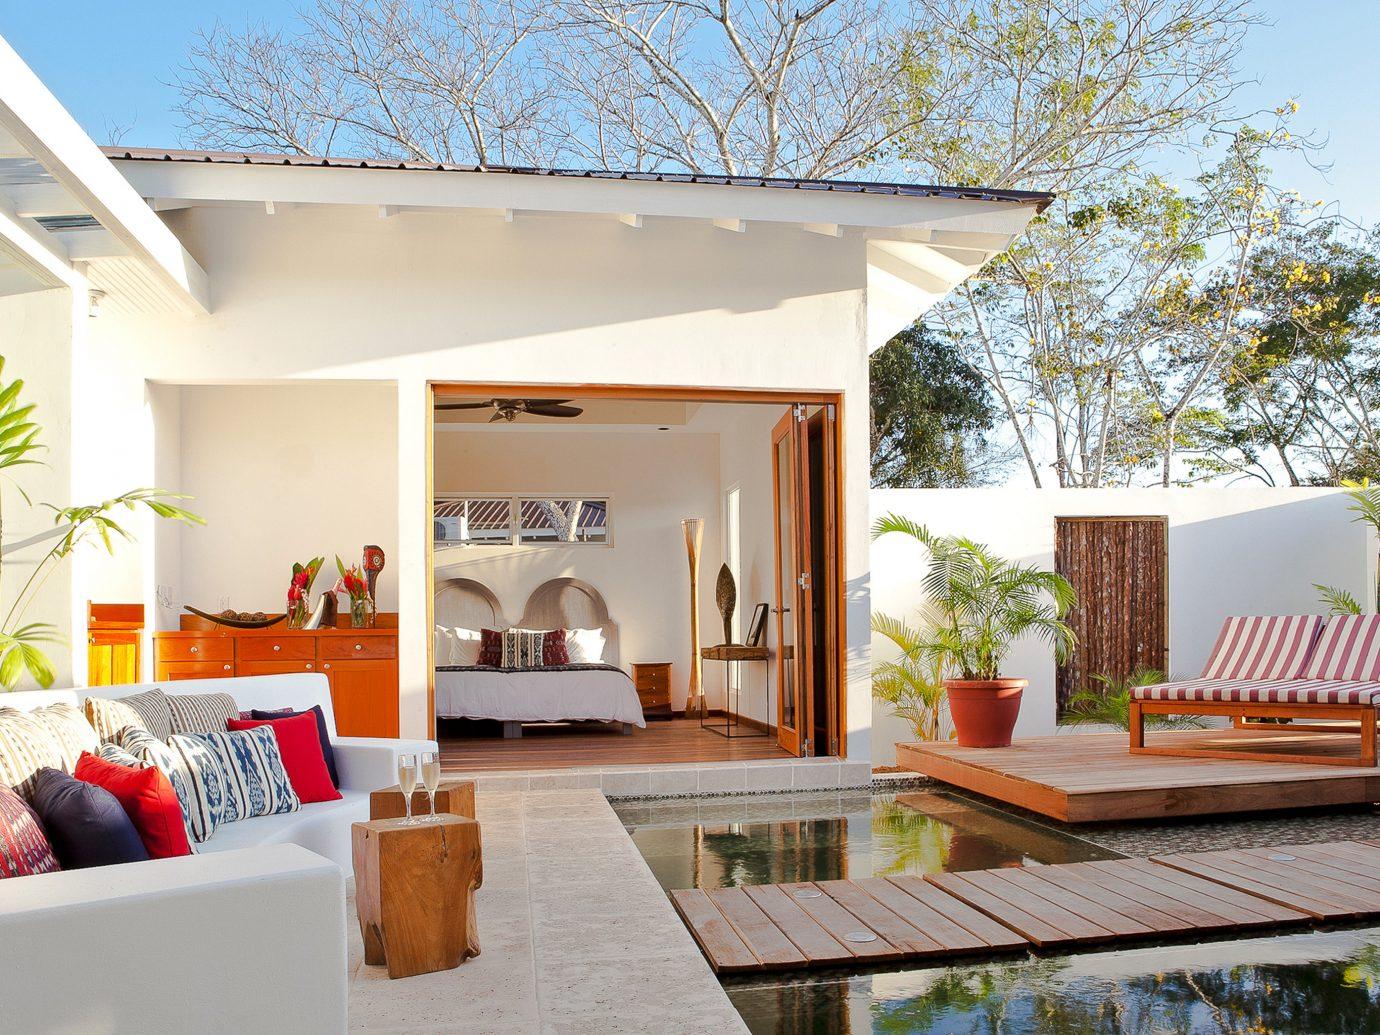 Private Patio And Pool At Ka'Ana Resort In San Ignacio, Belize